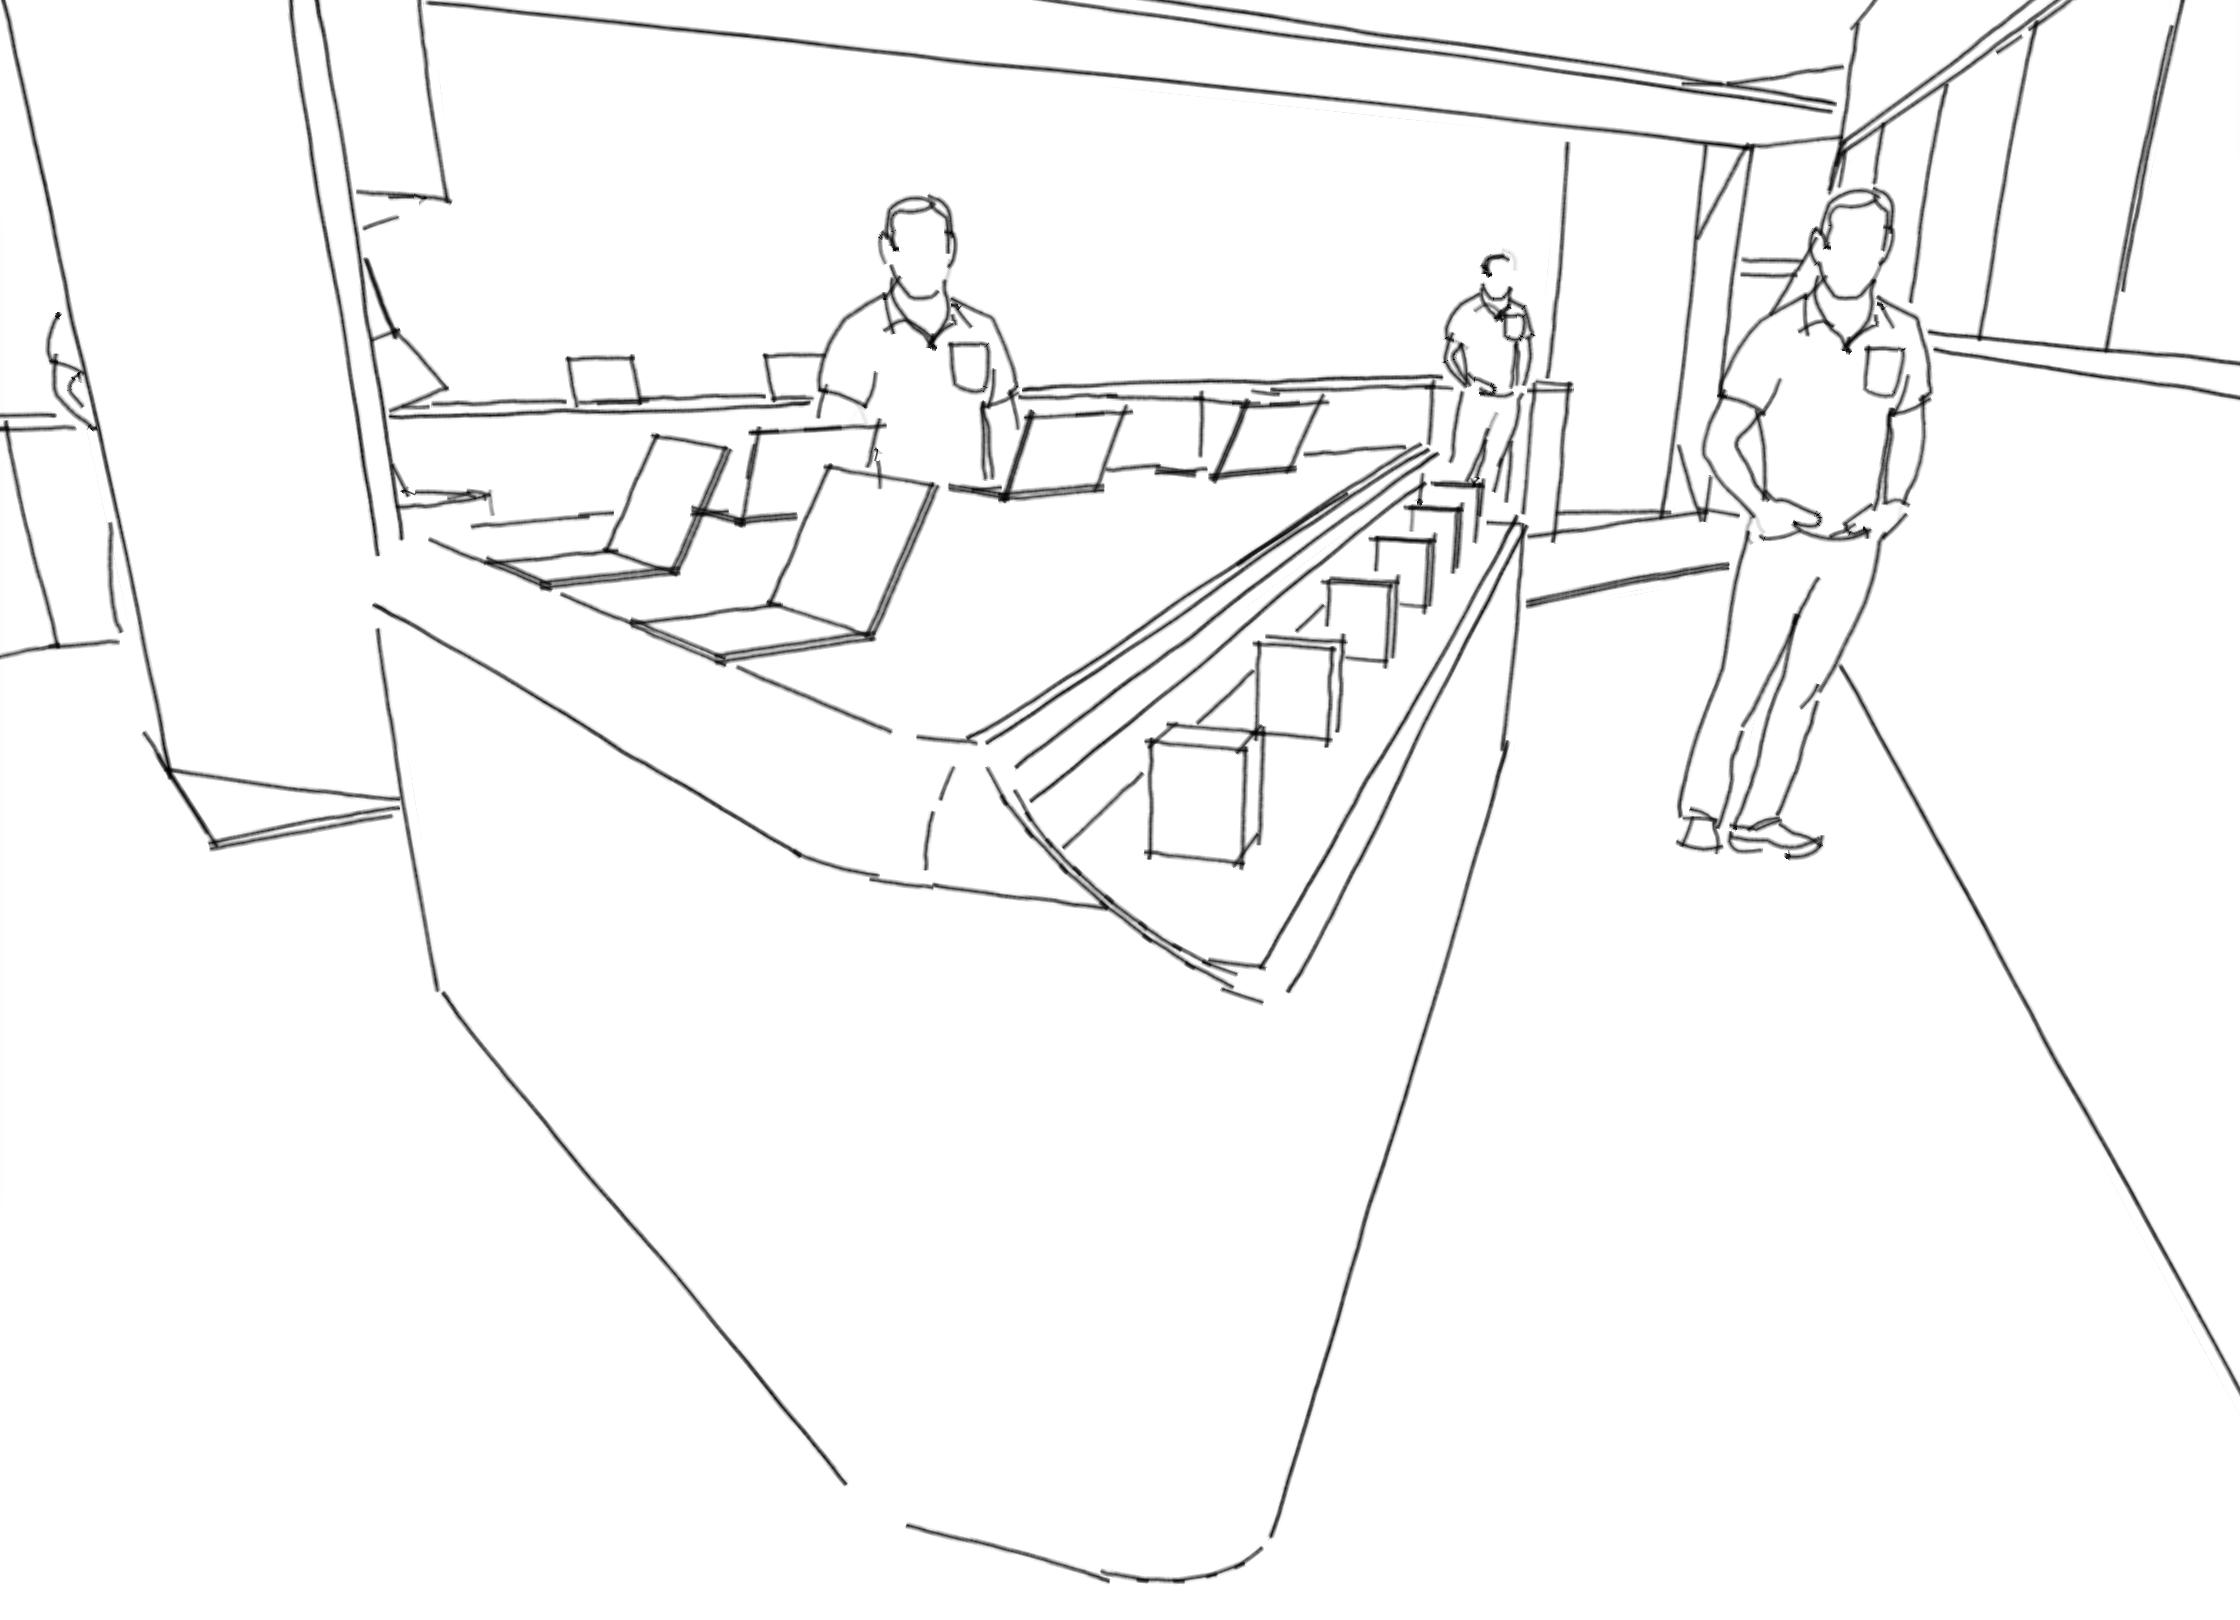 5. exploration bar